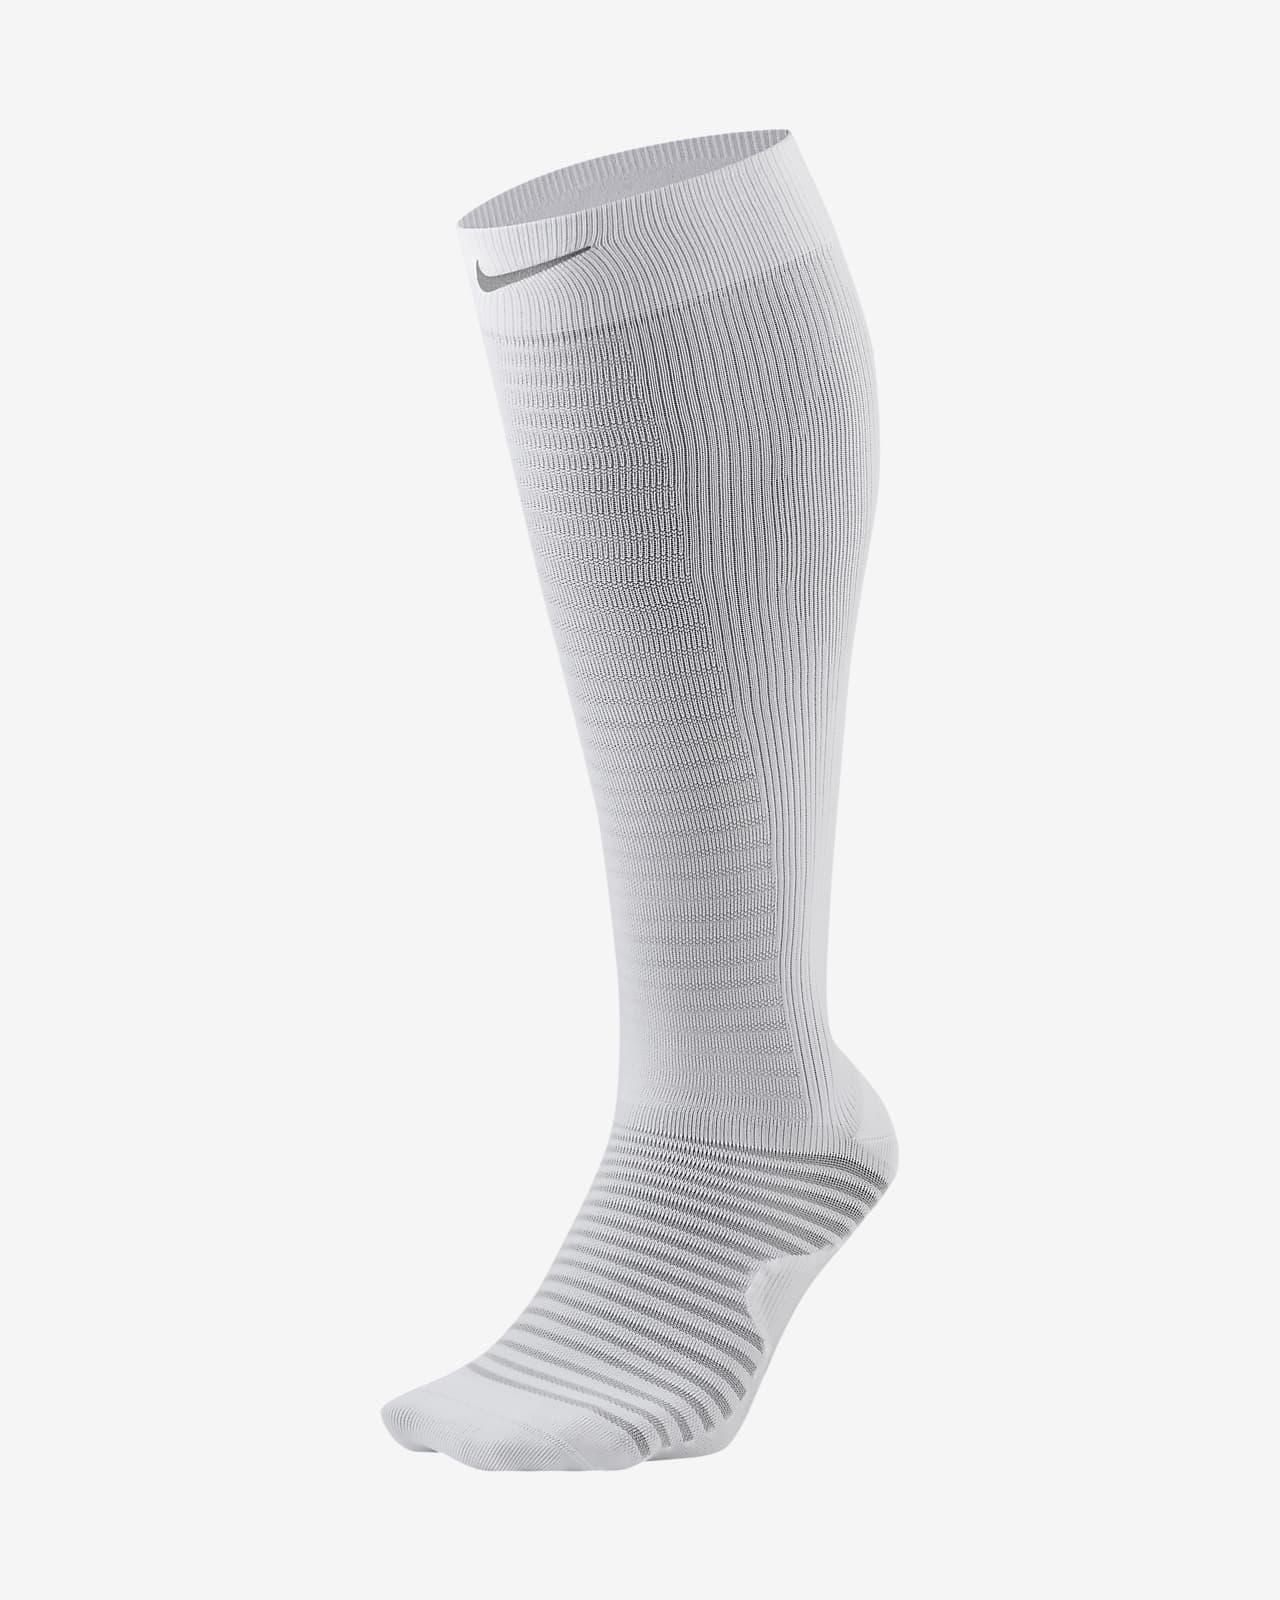 Chaussettes de running hautes de compression Nike Spark Lightweight